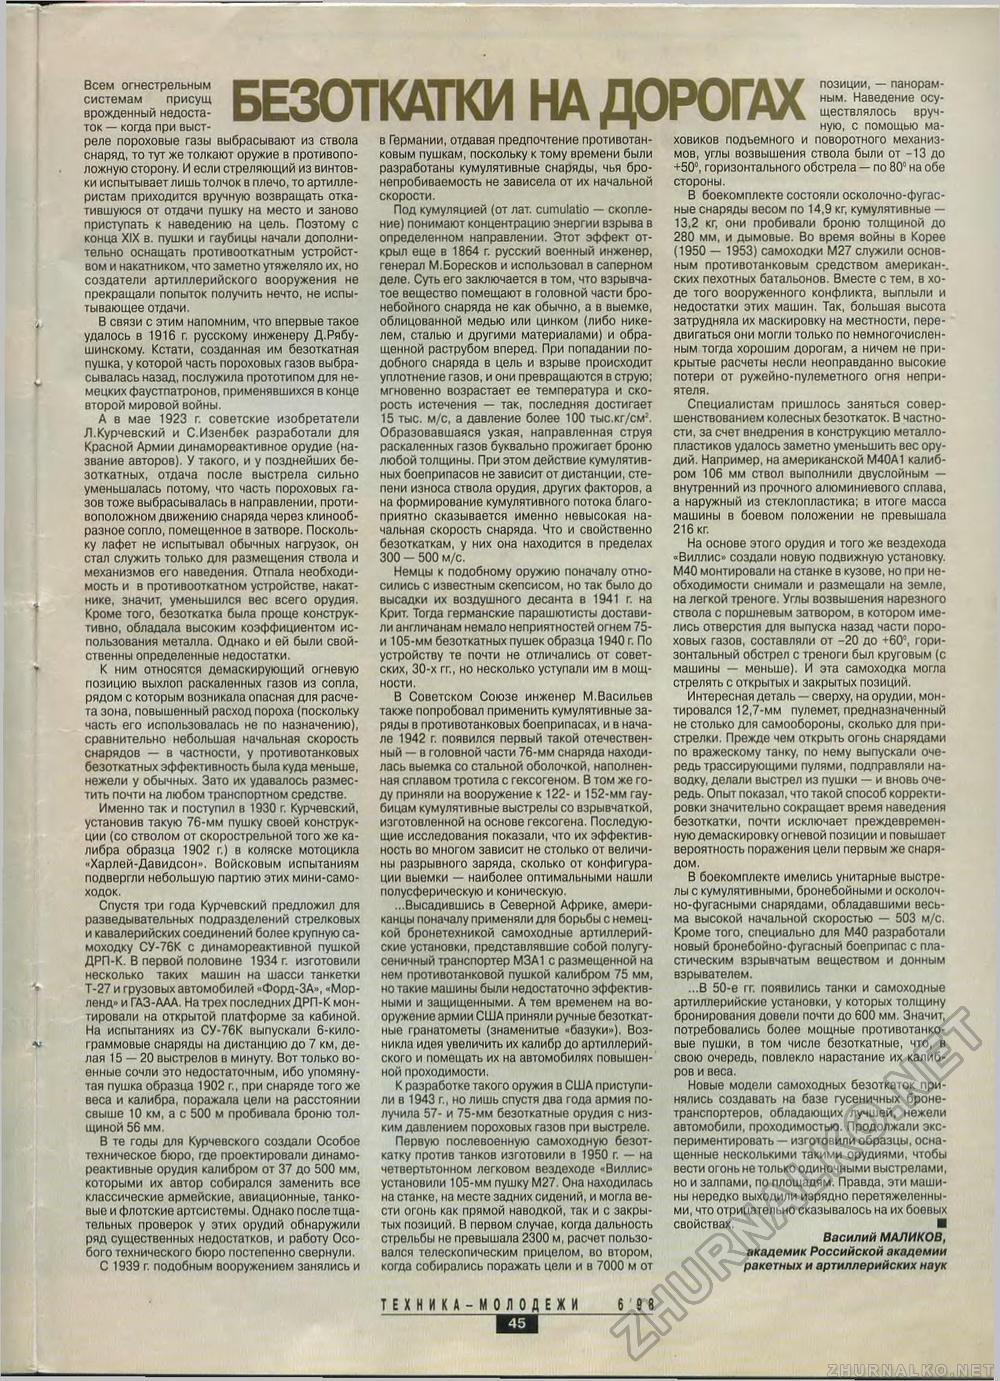 Техника - молодёжи 1998-06, страница 45